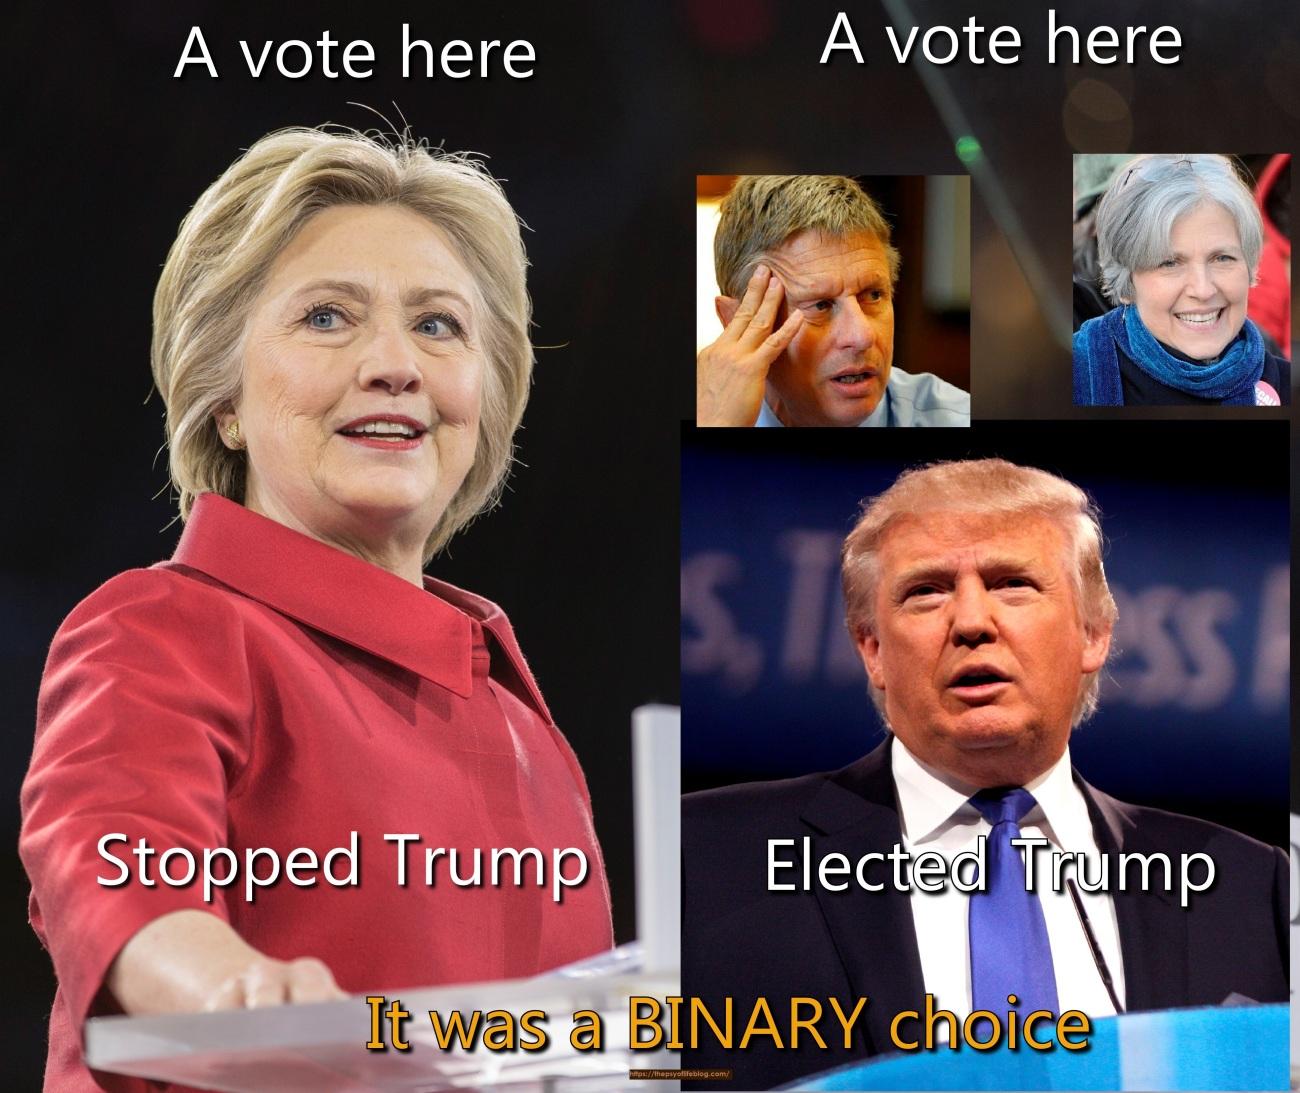 BinaryChoiceMEME.jpg